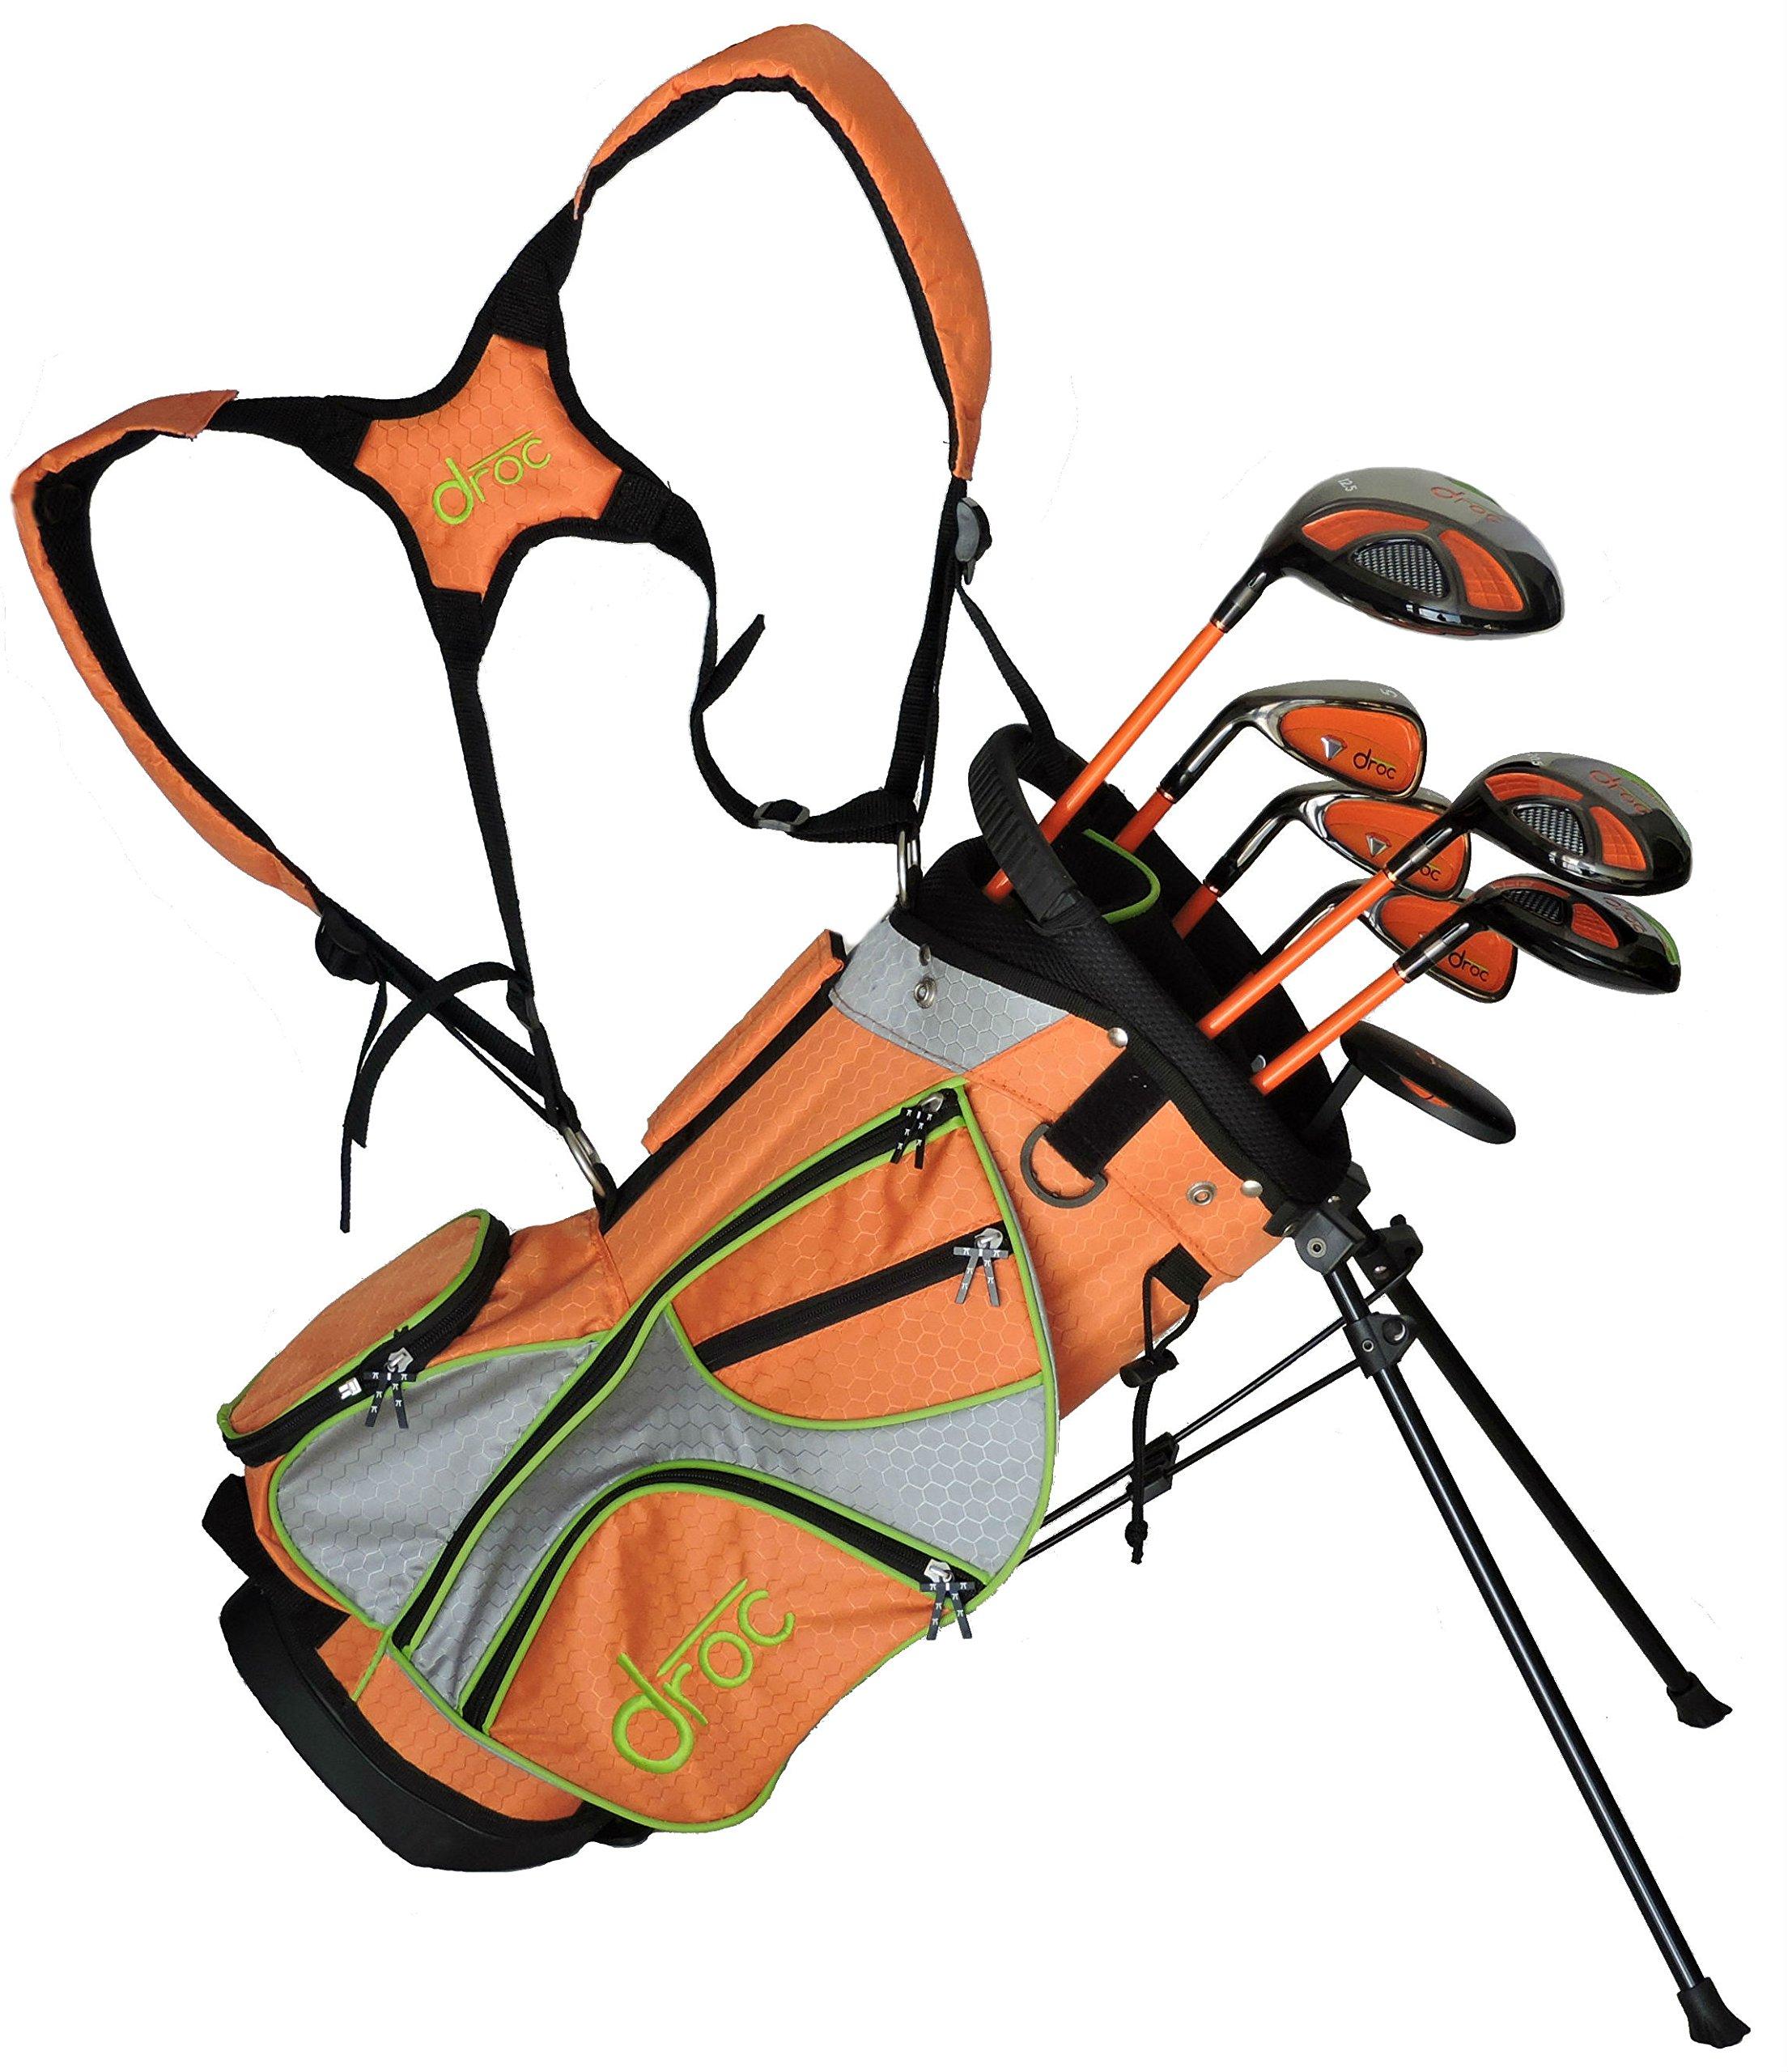 droc - Mica Left Handed Series 7 Pieces Golf Club Set & Golf Bag Ages 3-6 Left Handed (Titanium, Regular) by droc (Image #1)